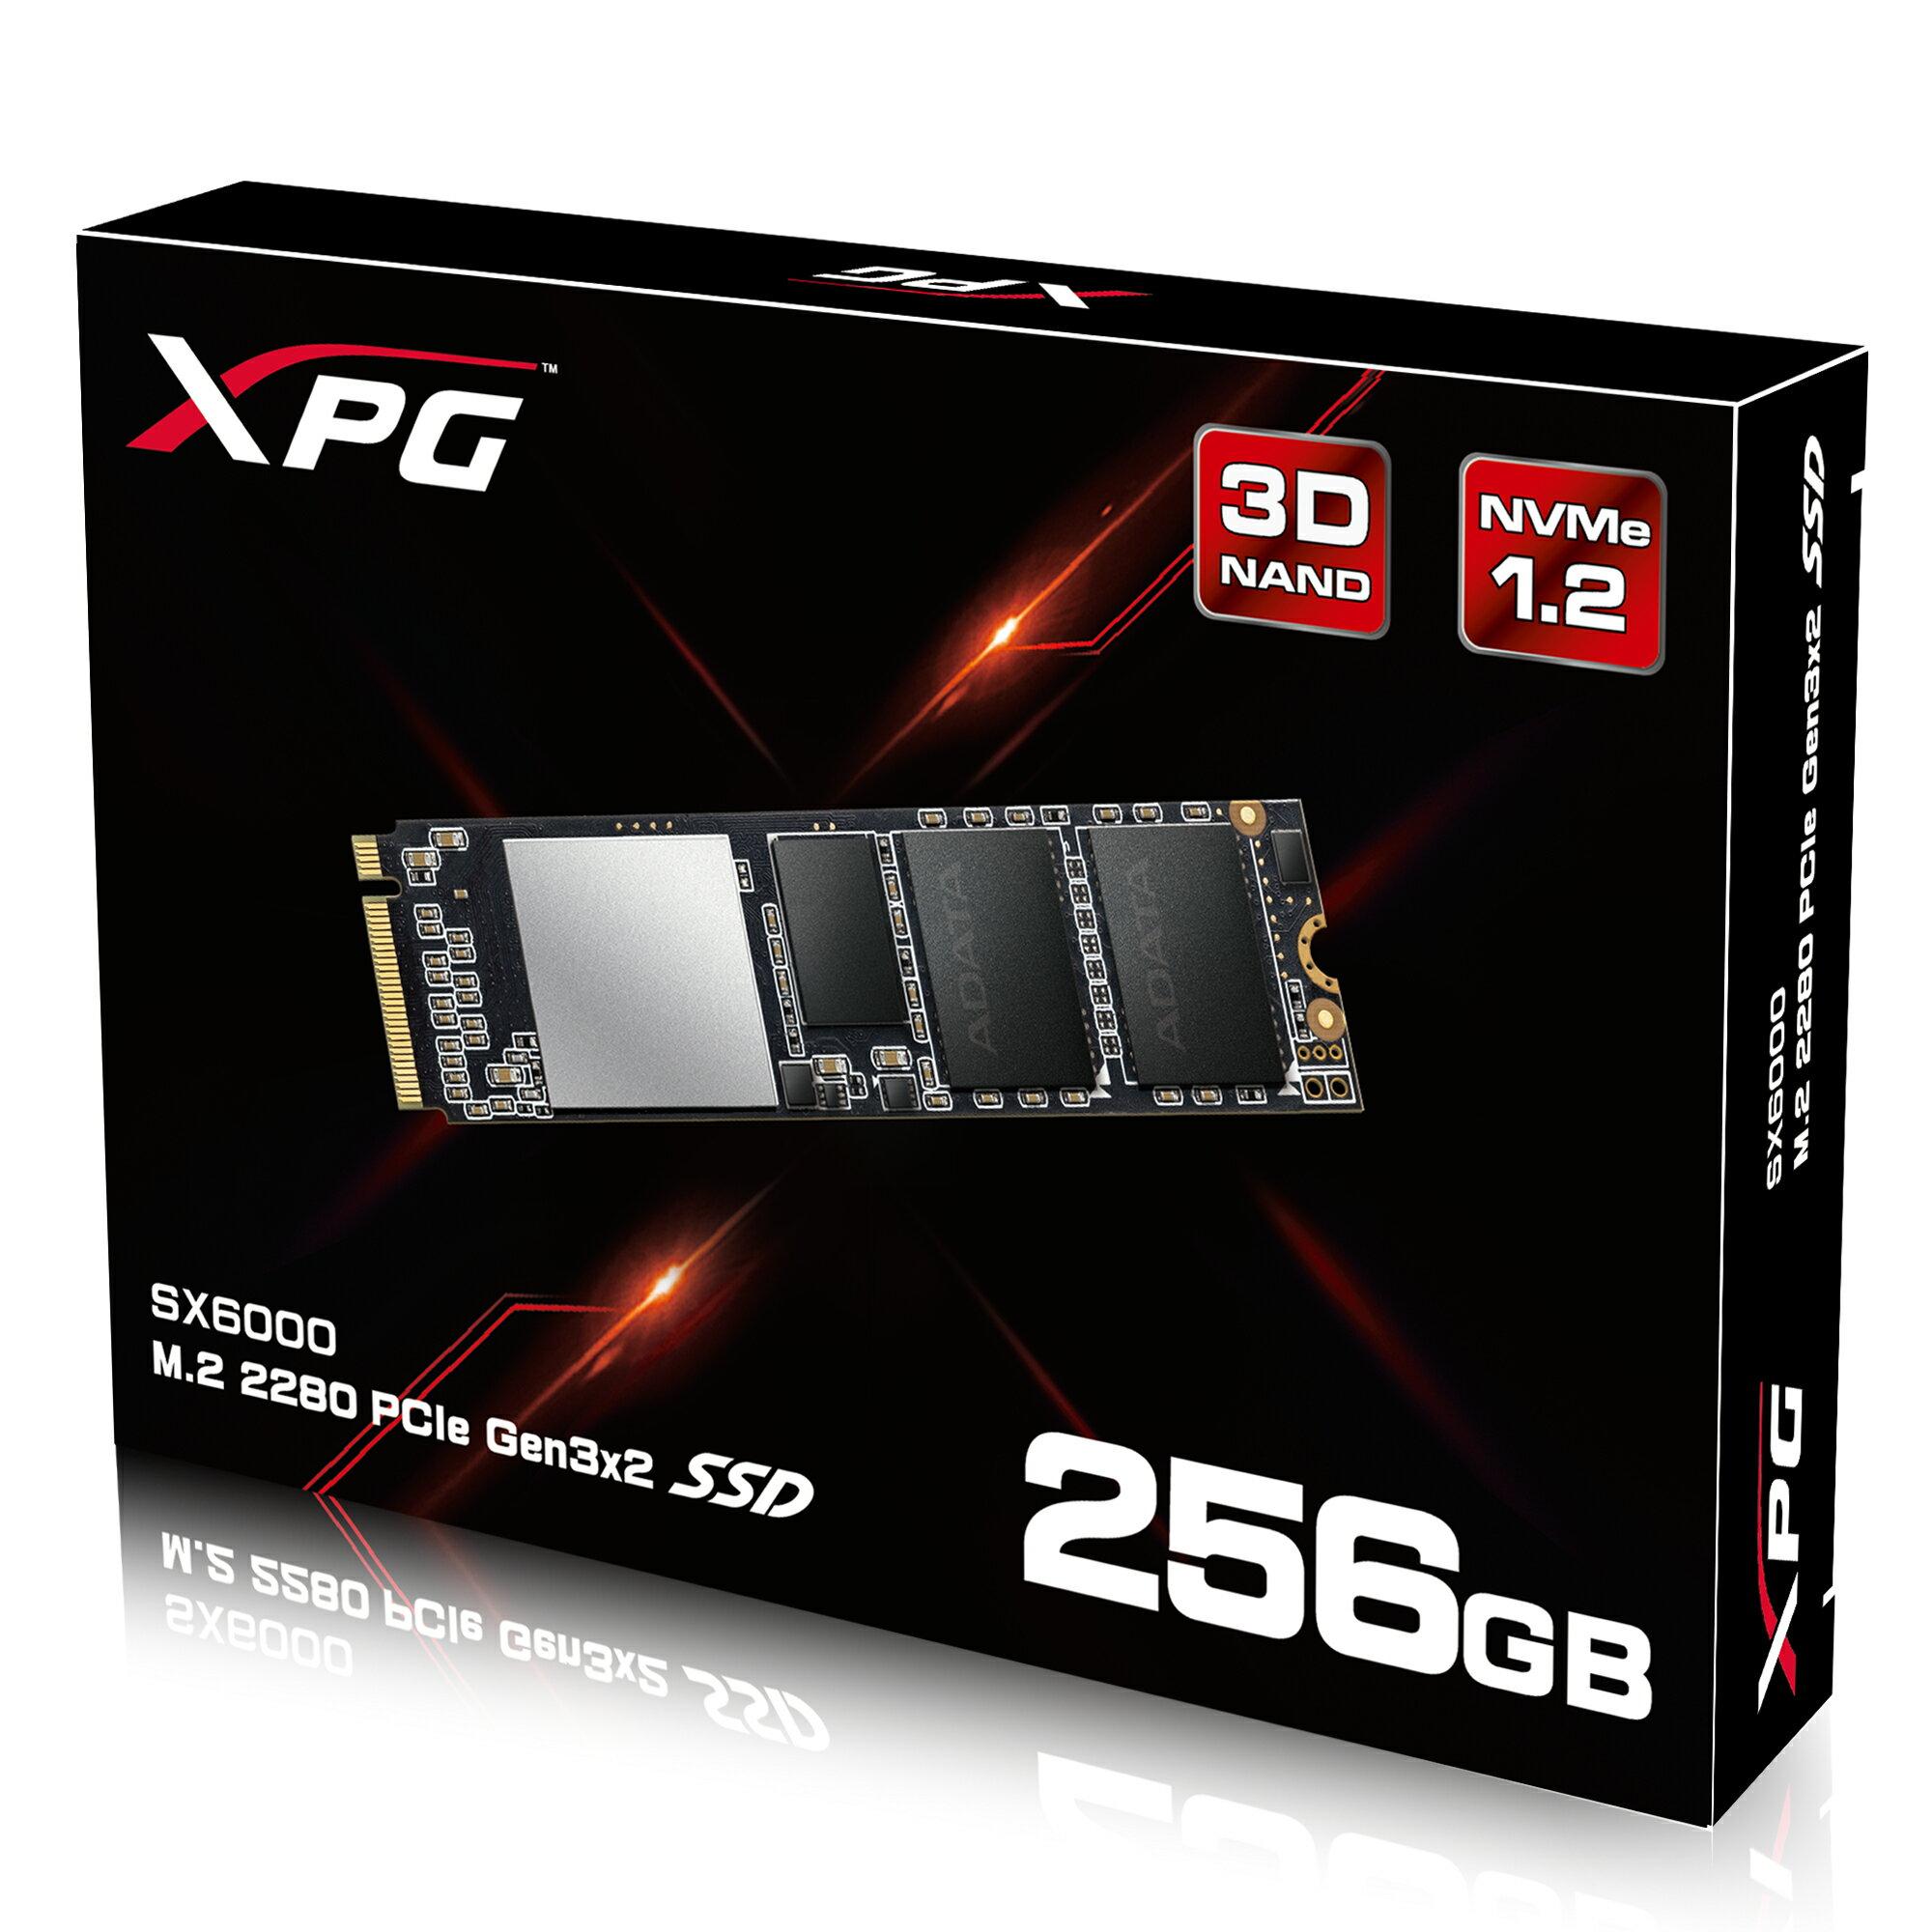 XPG SX6000 PCIe NMVe Gen3x2 M.2 2280 256GB SSD by ADATA with DIY XPG Heatsink 0